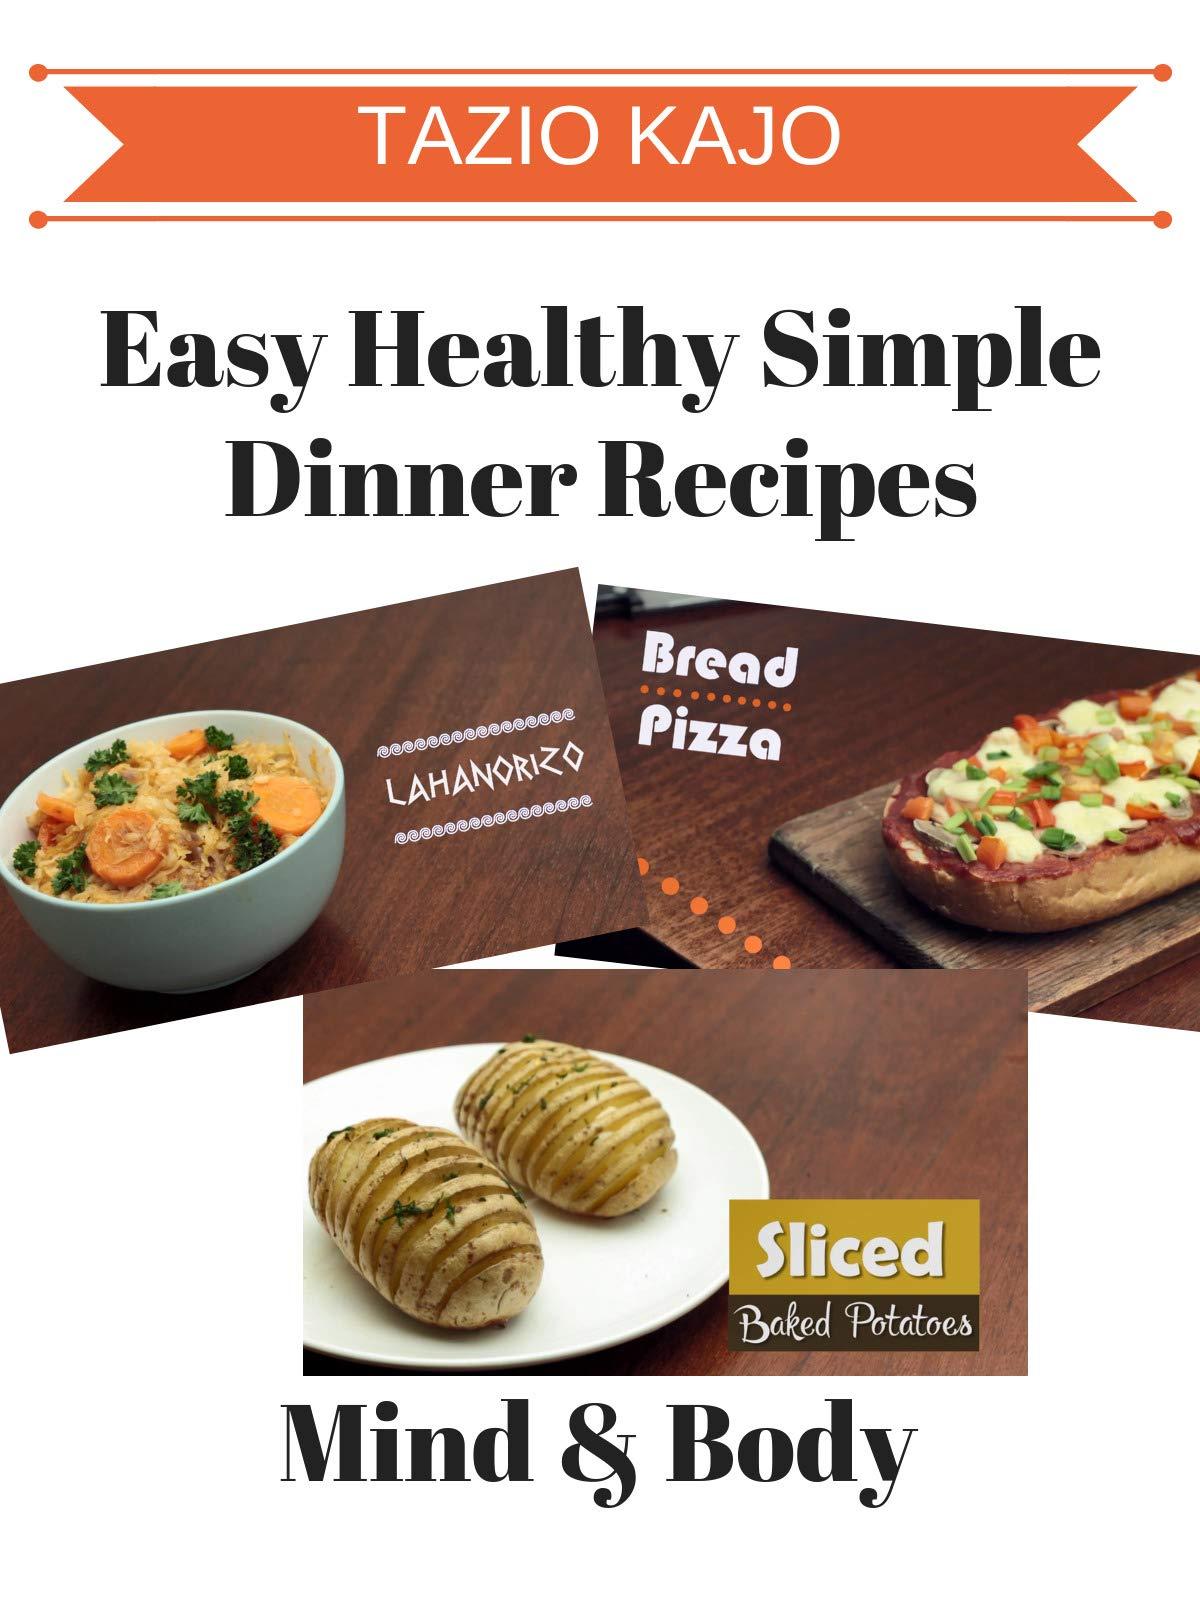 Easy Healthy Simple Dinner Recipe